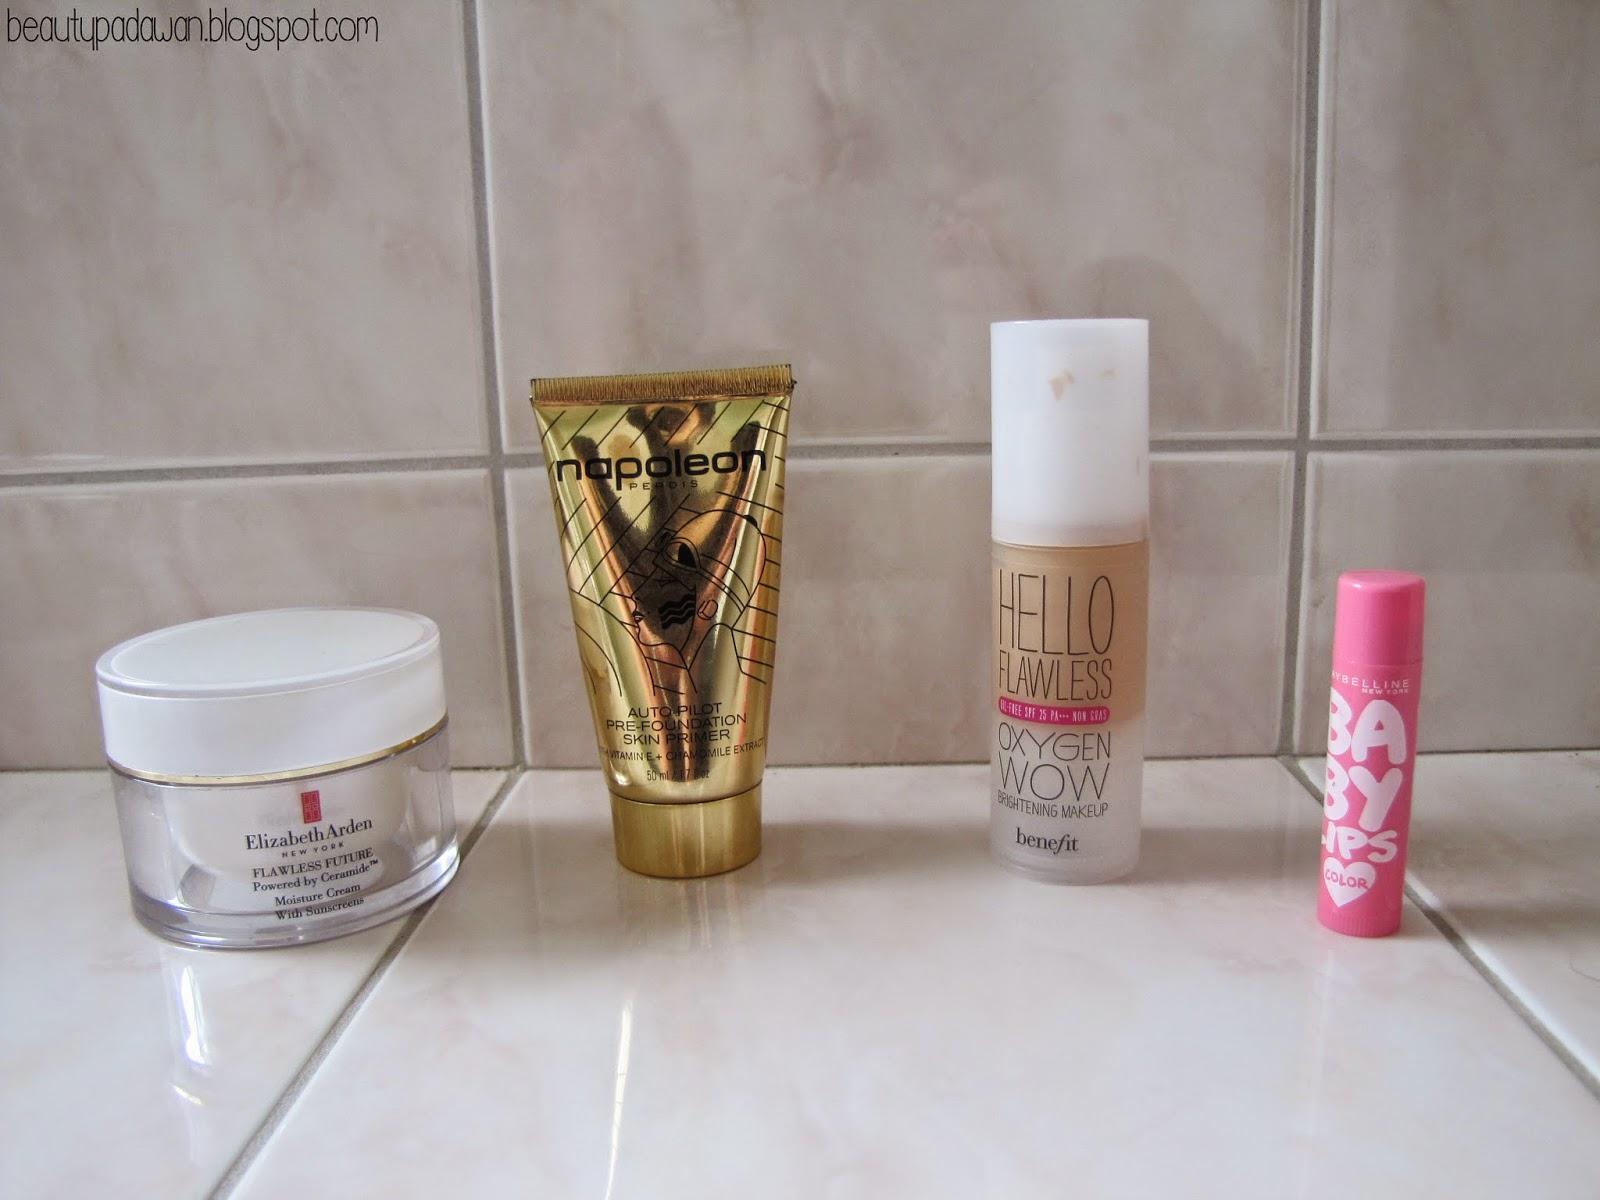 "Elizabeth Arden Flawless Future Moisture Cream; Napoleon Perdis Auto Pilot Pre-Foundation Skin Primer; Benefit Hello Flawless Oxygen WOW Foundation - ""Champagne""; Maybelline Baby Lips Lip Balm - ""Pink Lolita"""